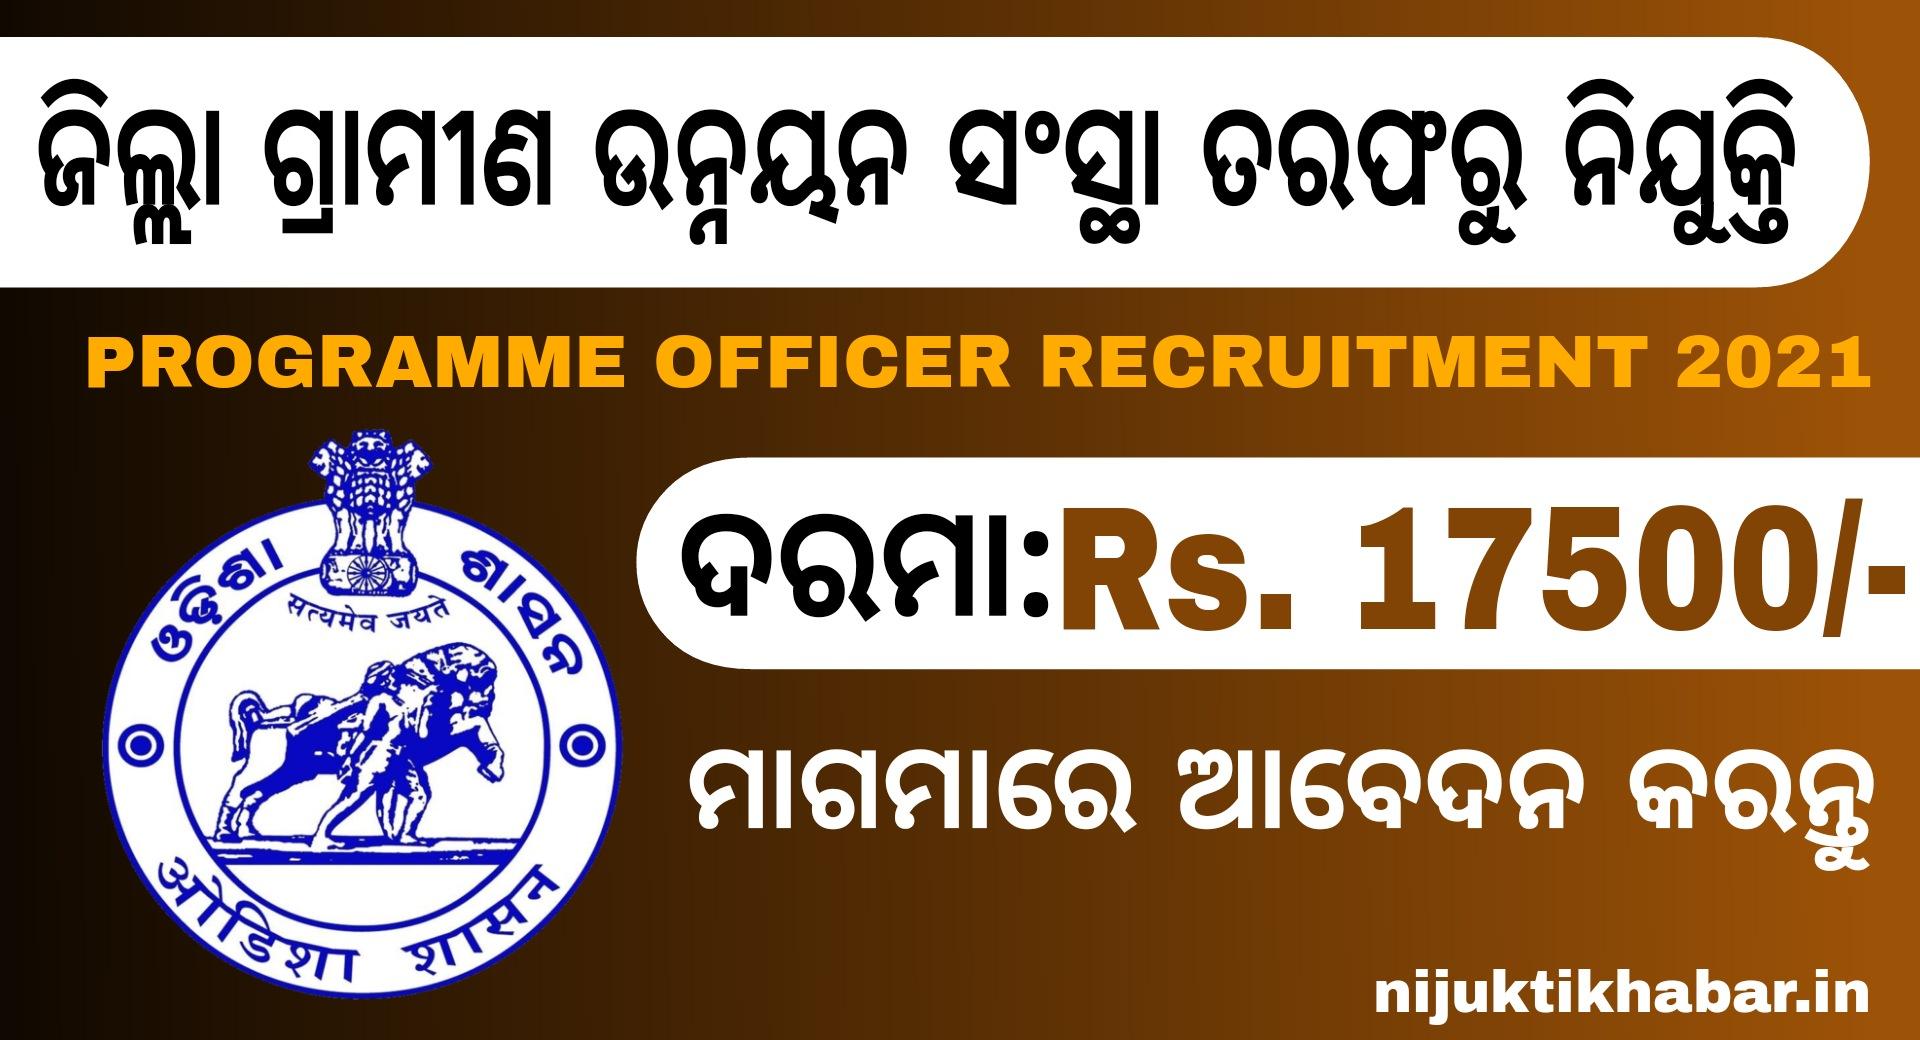 DRDA Nuapada Programme Officer Recruitment 2021 – Jobs in Odisha